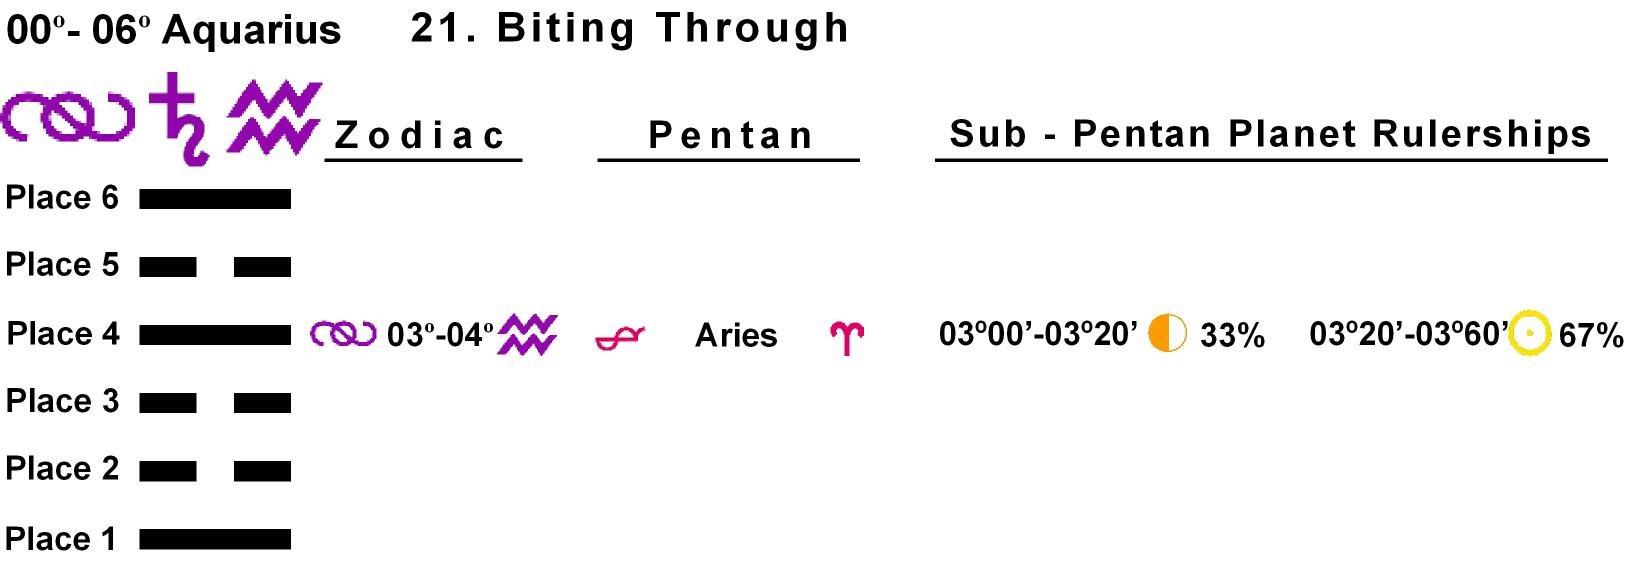 Pent-lines-11AQ 03-04 Hx-21 Biting Through